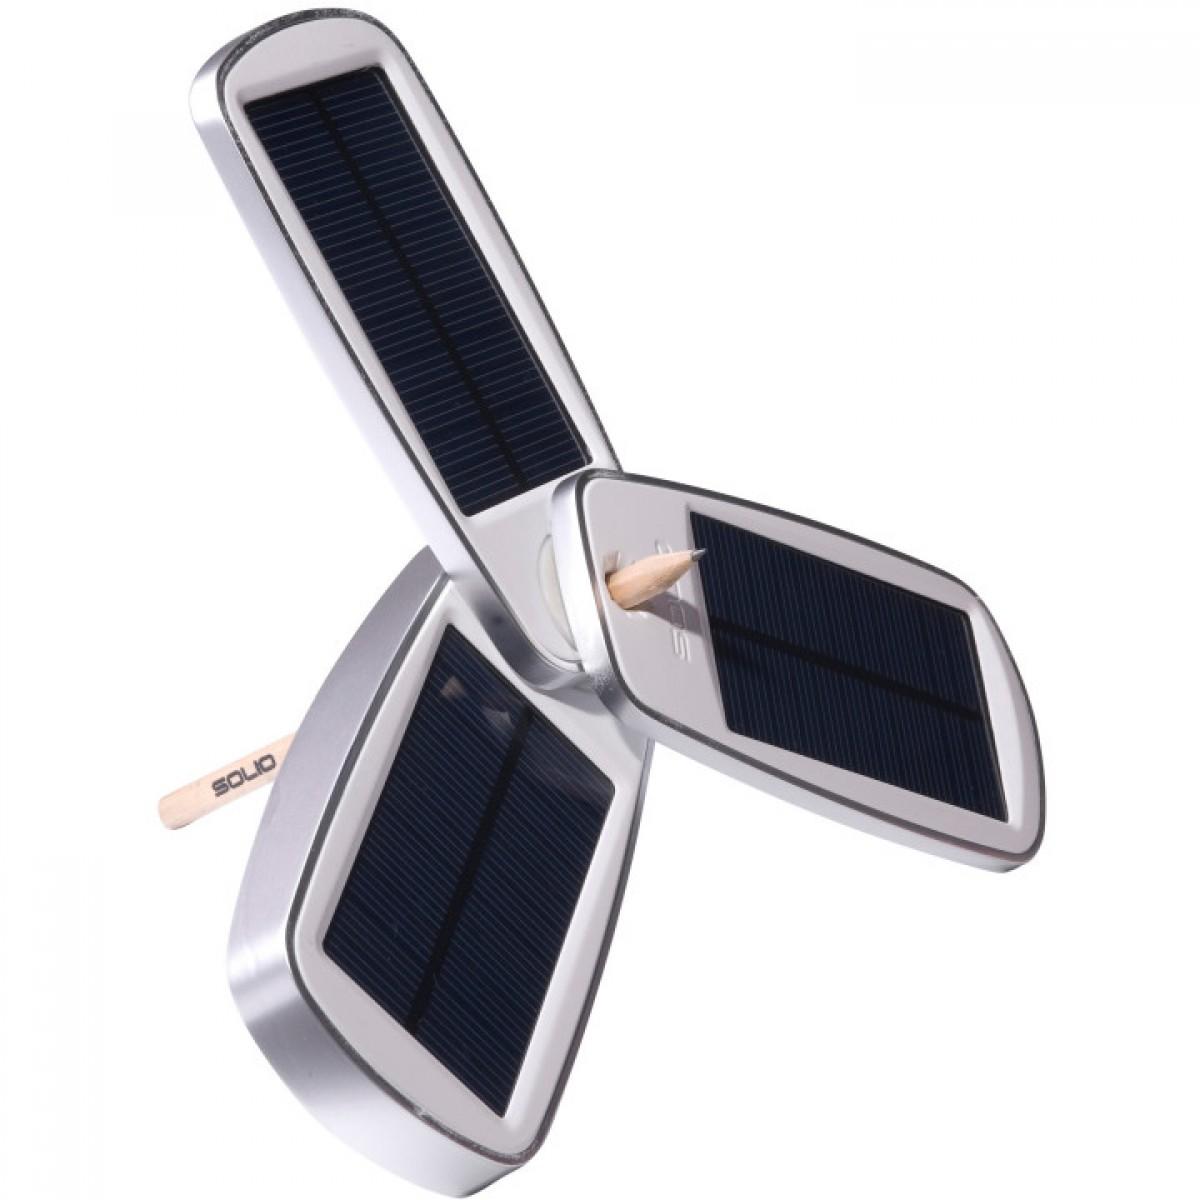 solio solar ladeger te so s620 ah1rw classic2 akku. Black Bedroom Furniture Sets. Home Design Ideas